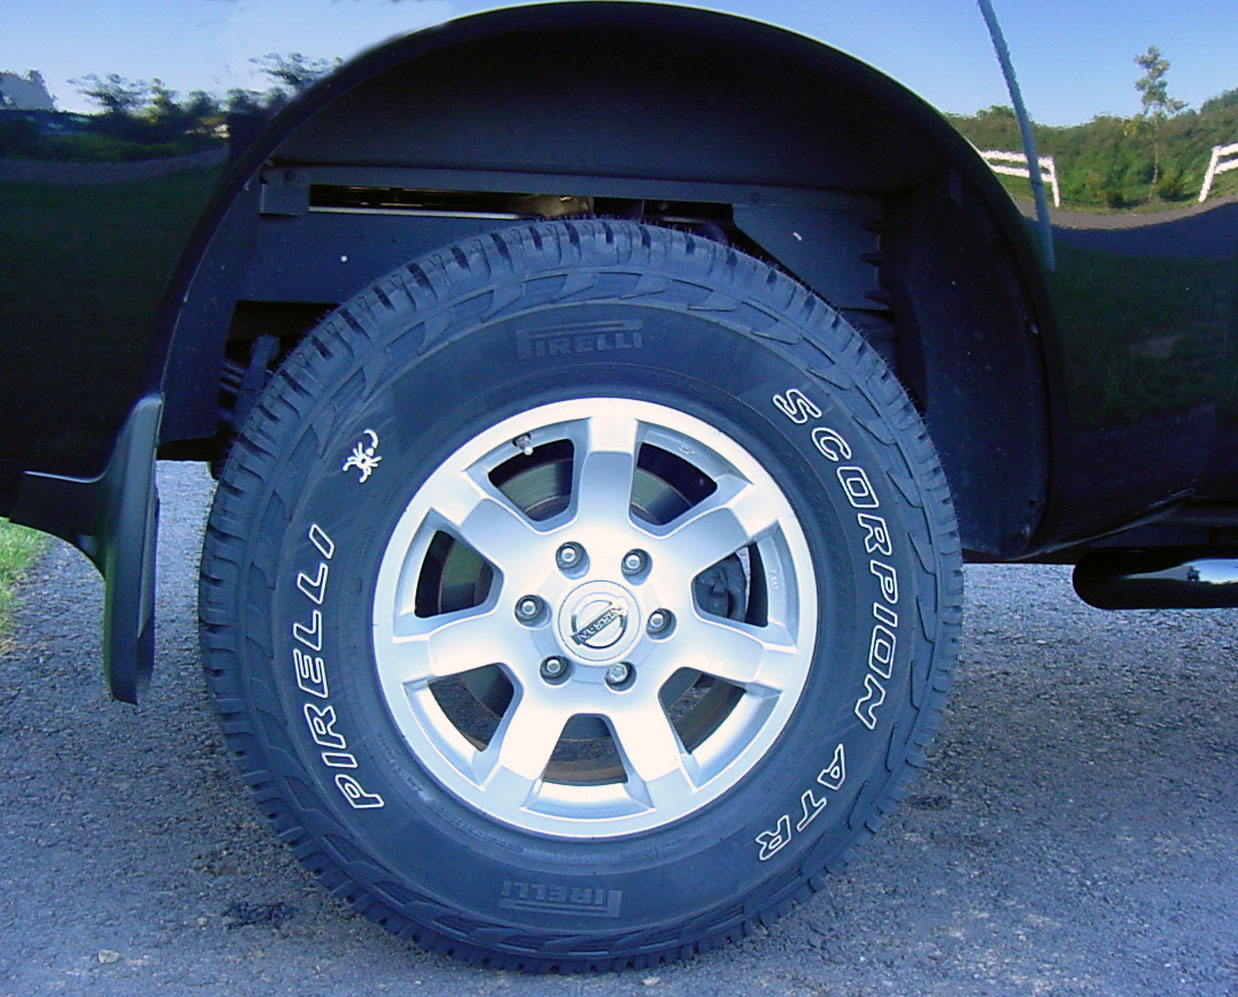 Pirelli Scorpion Atr Nissan Titan Forum